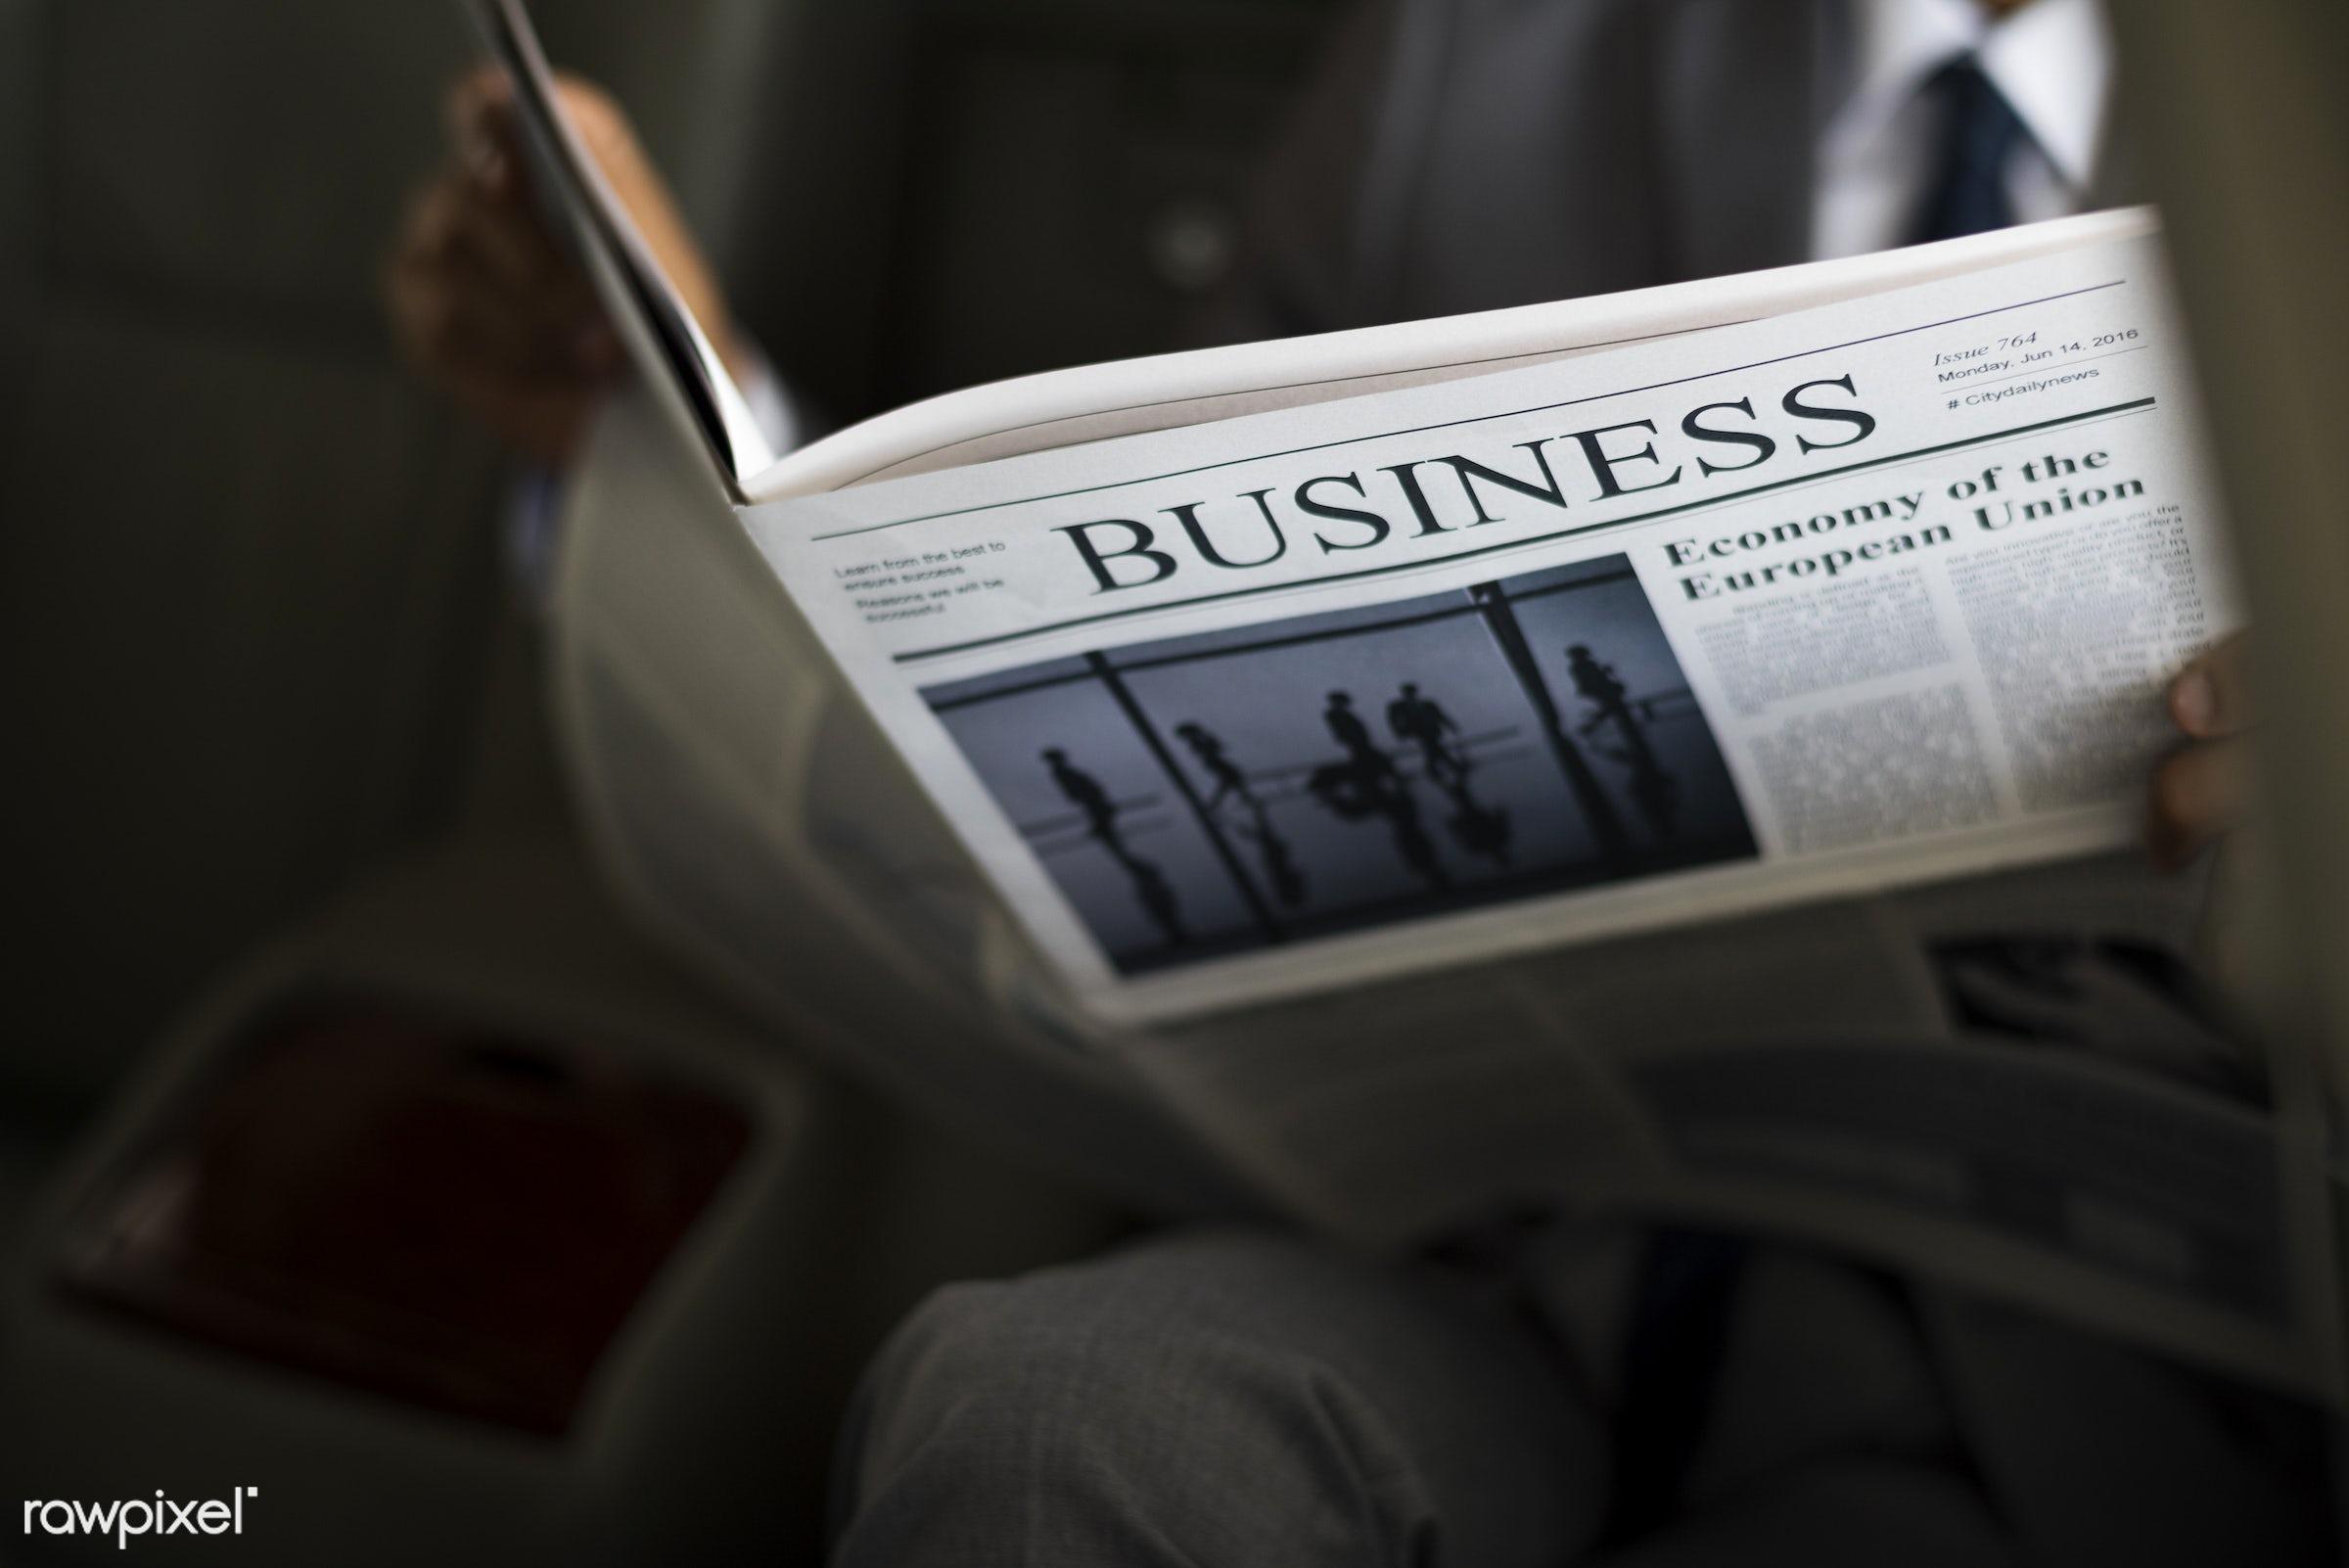 news, car, newspaper, relax, adult, back seat, break, breaking news, business, businessman, businessmen, candid,...